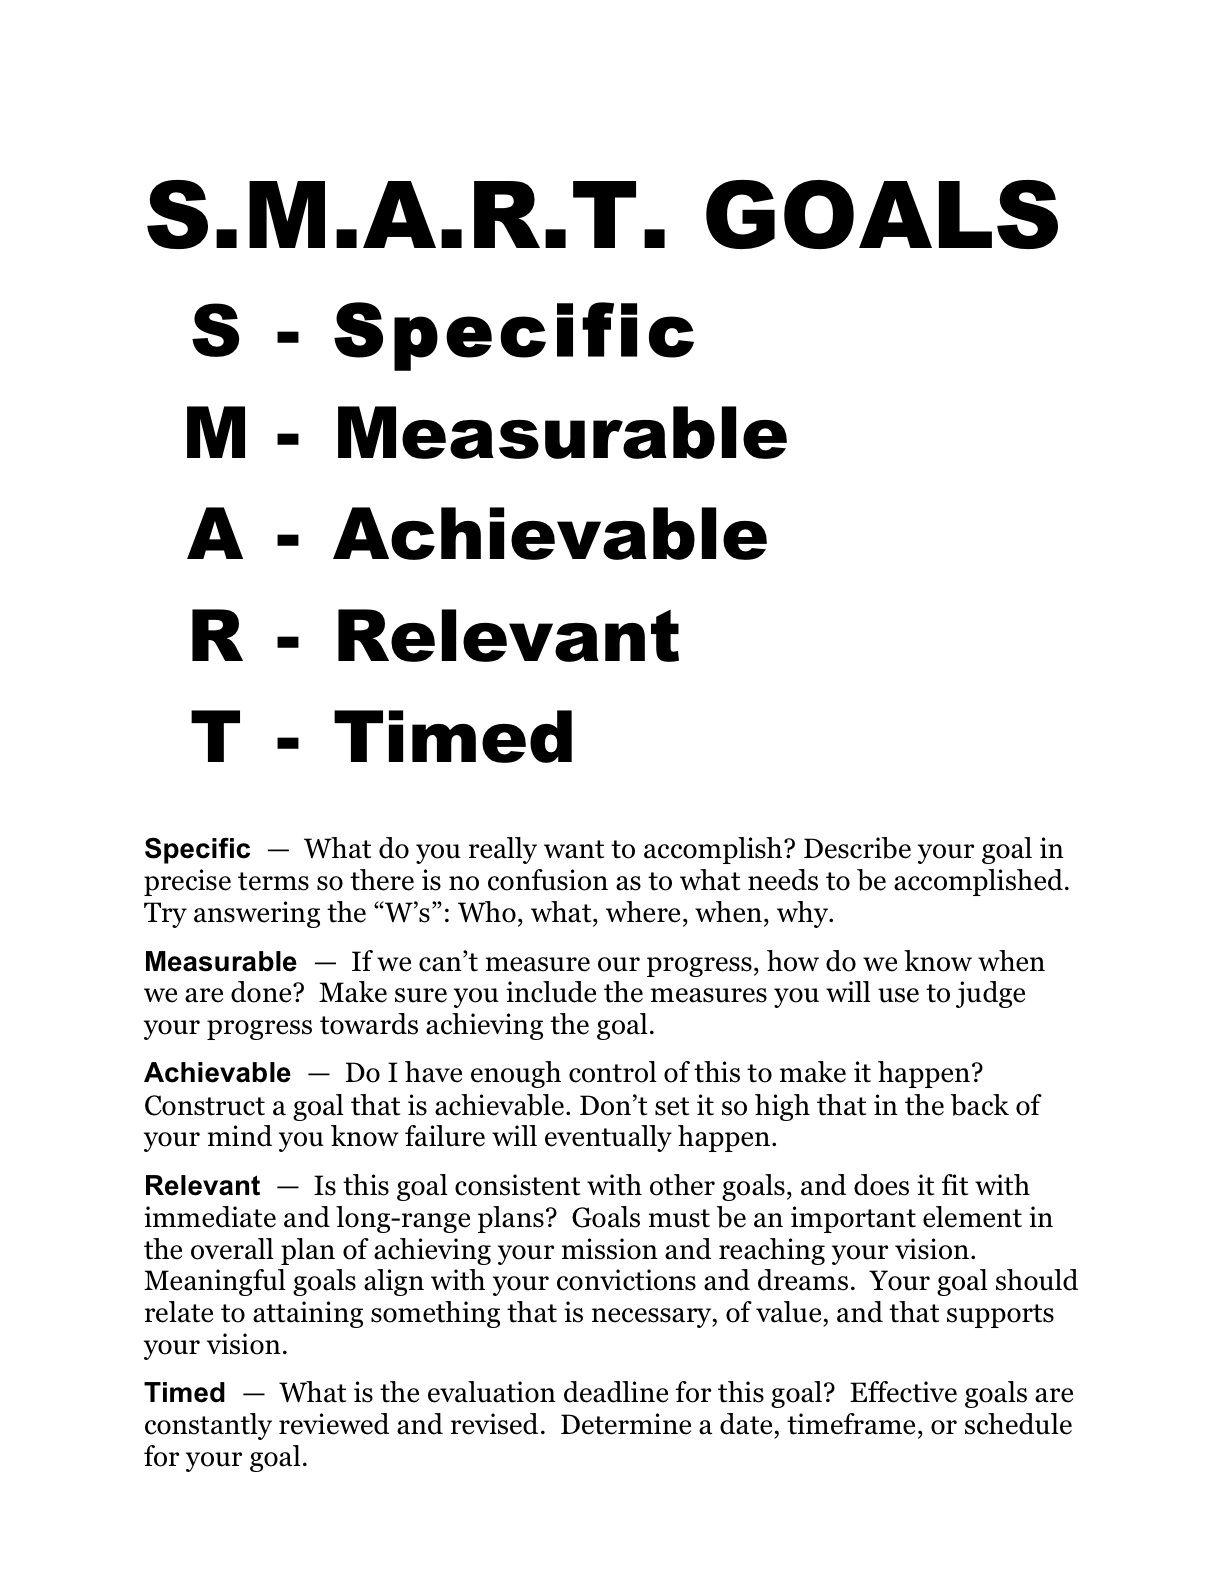 Smart Goal Worksheet PDF   Smart goals worksheet [ 1584 x 1224 Pixel ]